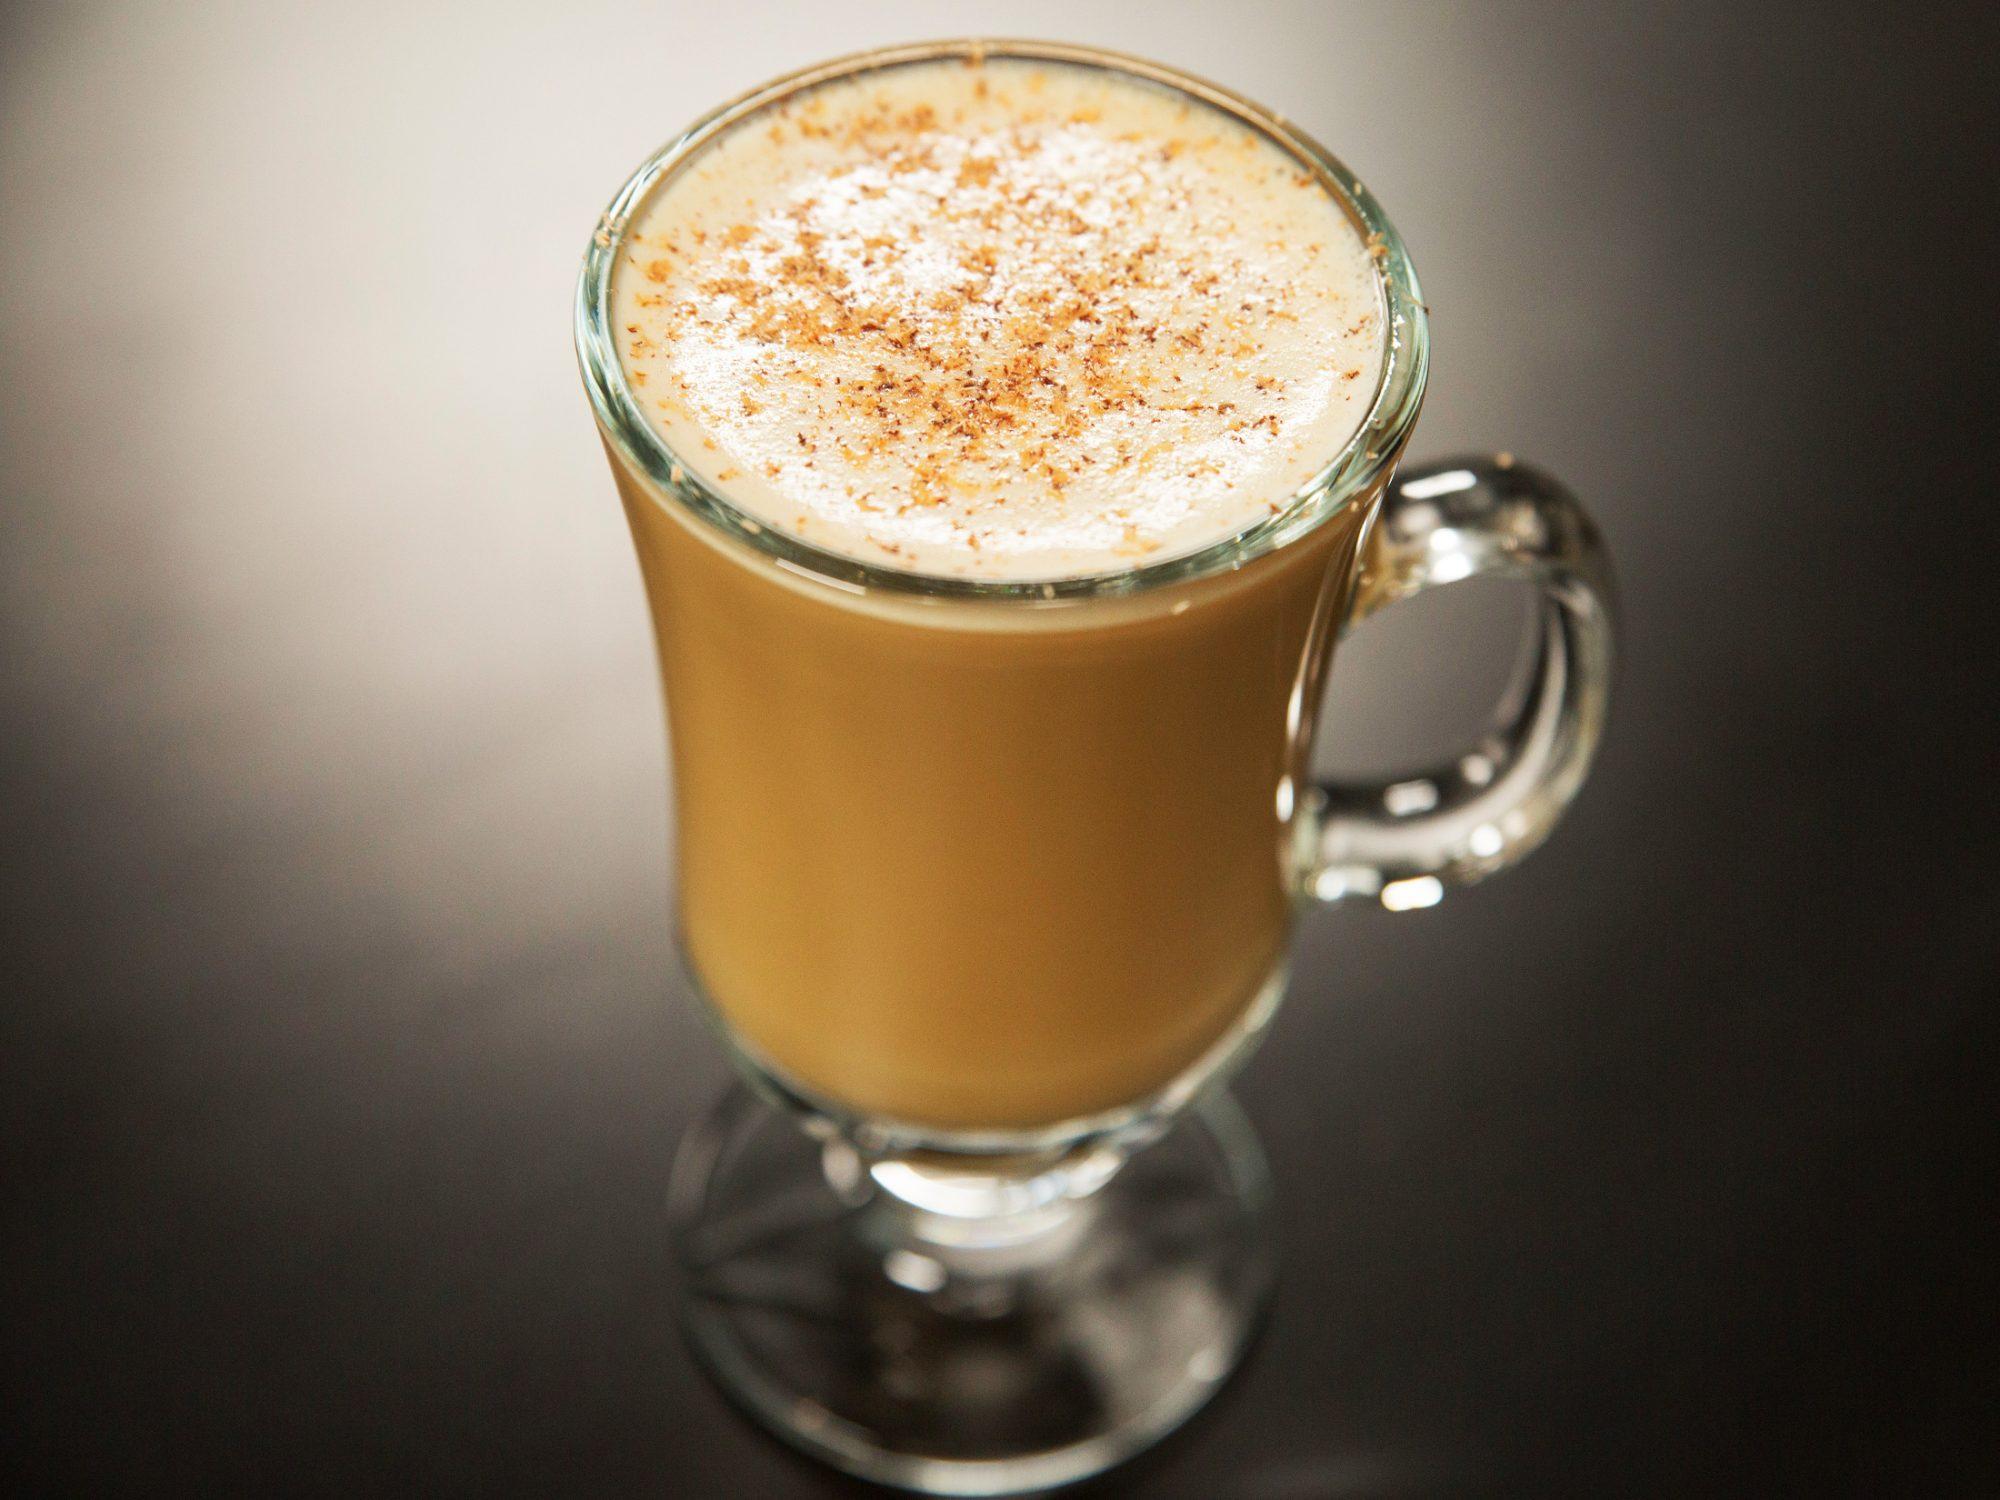 Copycat-Starbucks-Eggnog-Latte-DCMS-Large.jpg